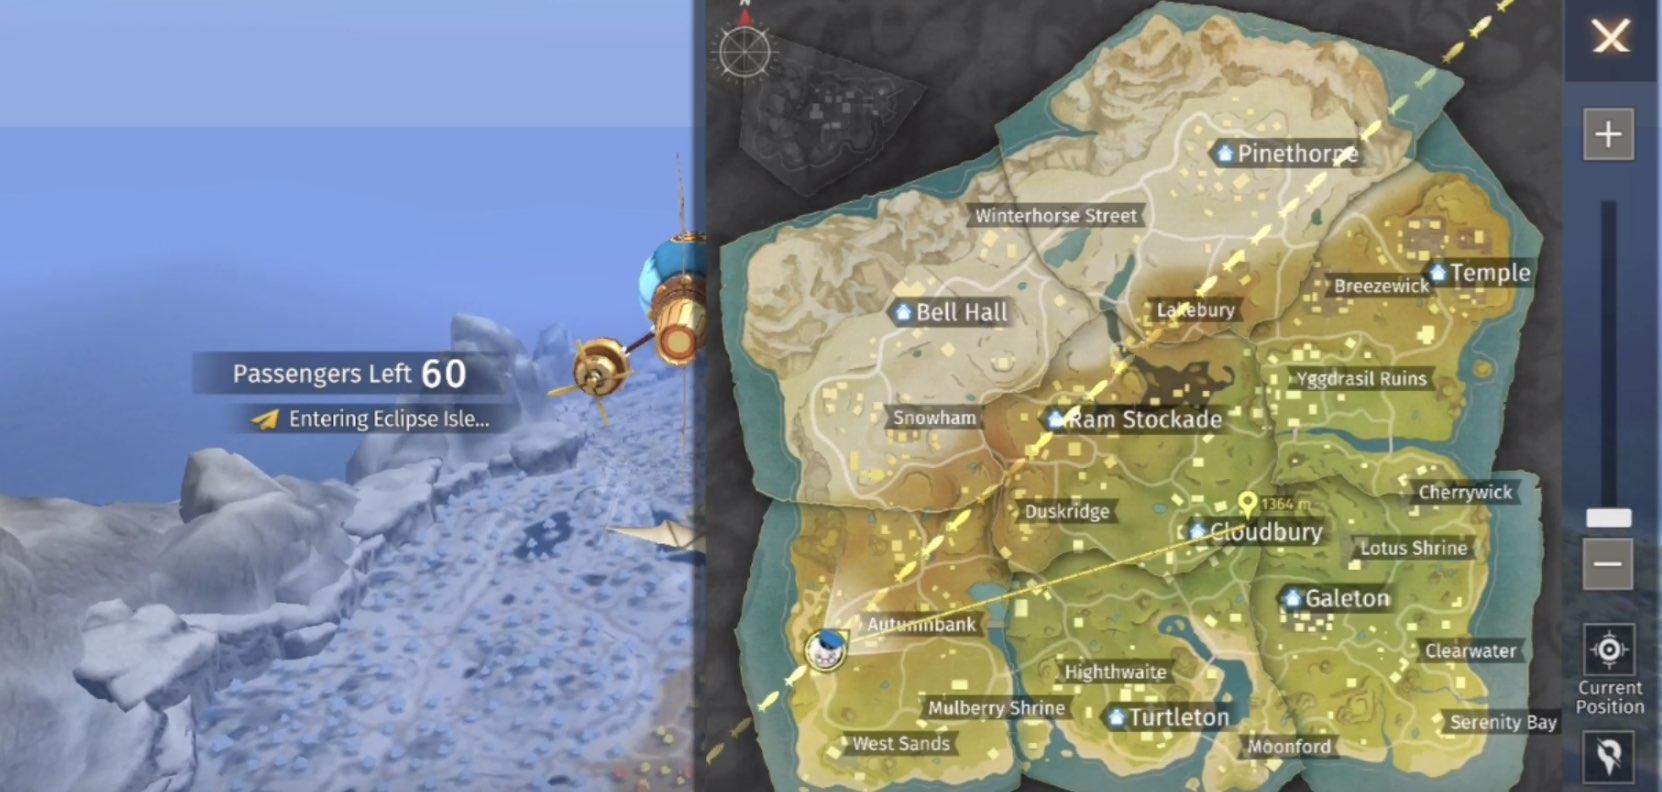 Eclipse Isle tips